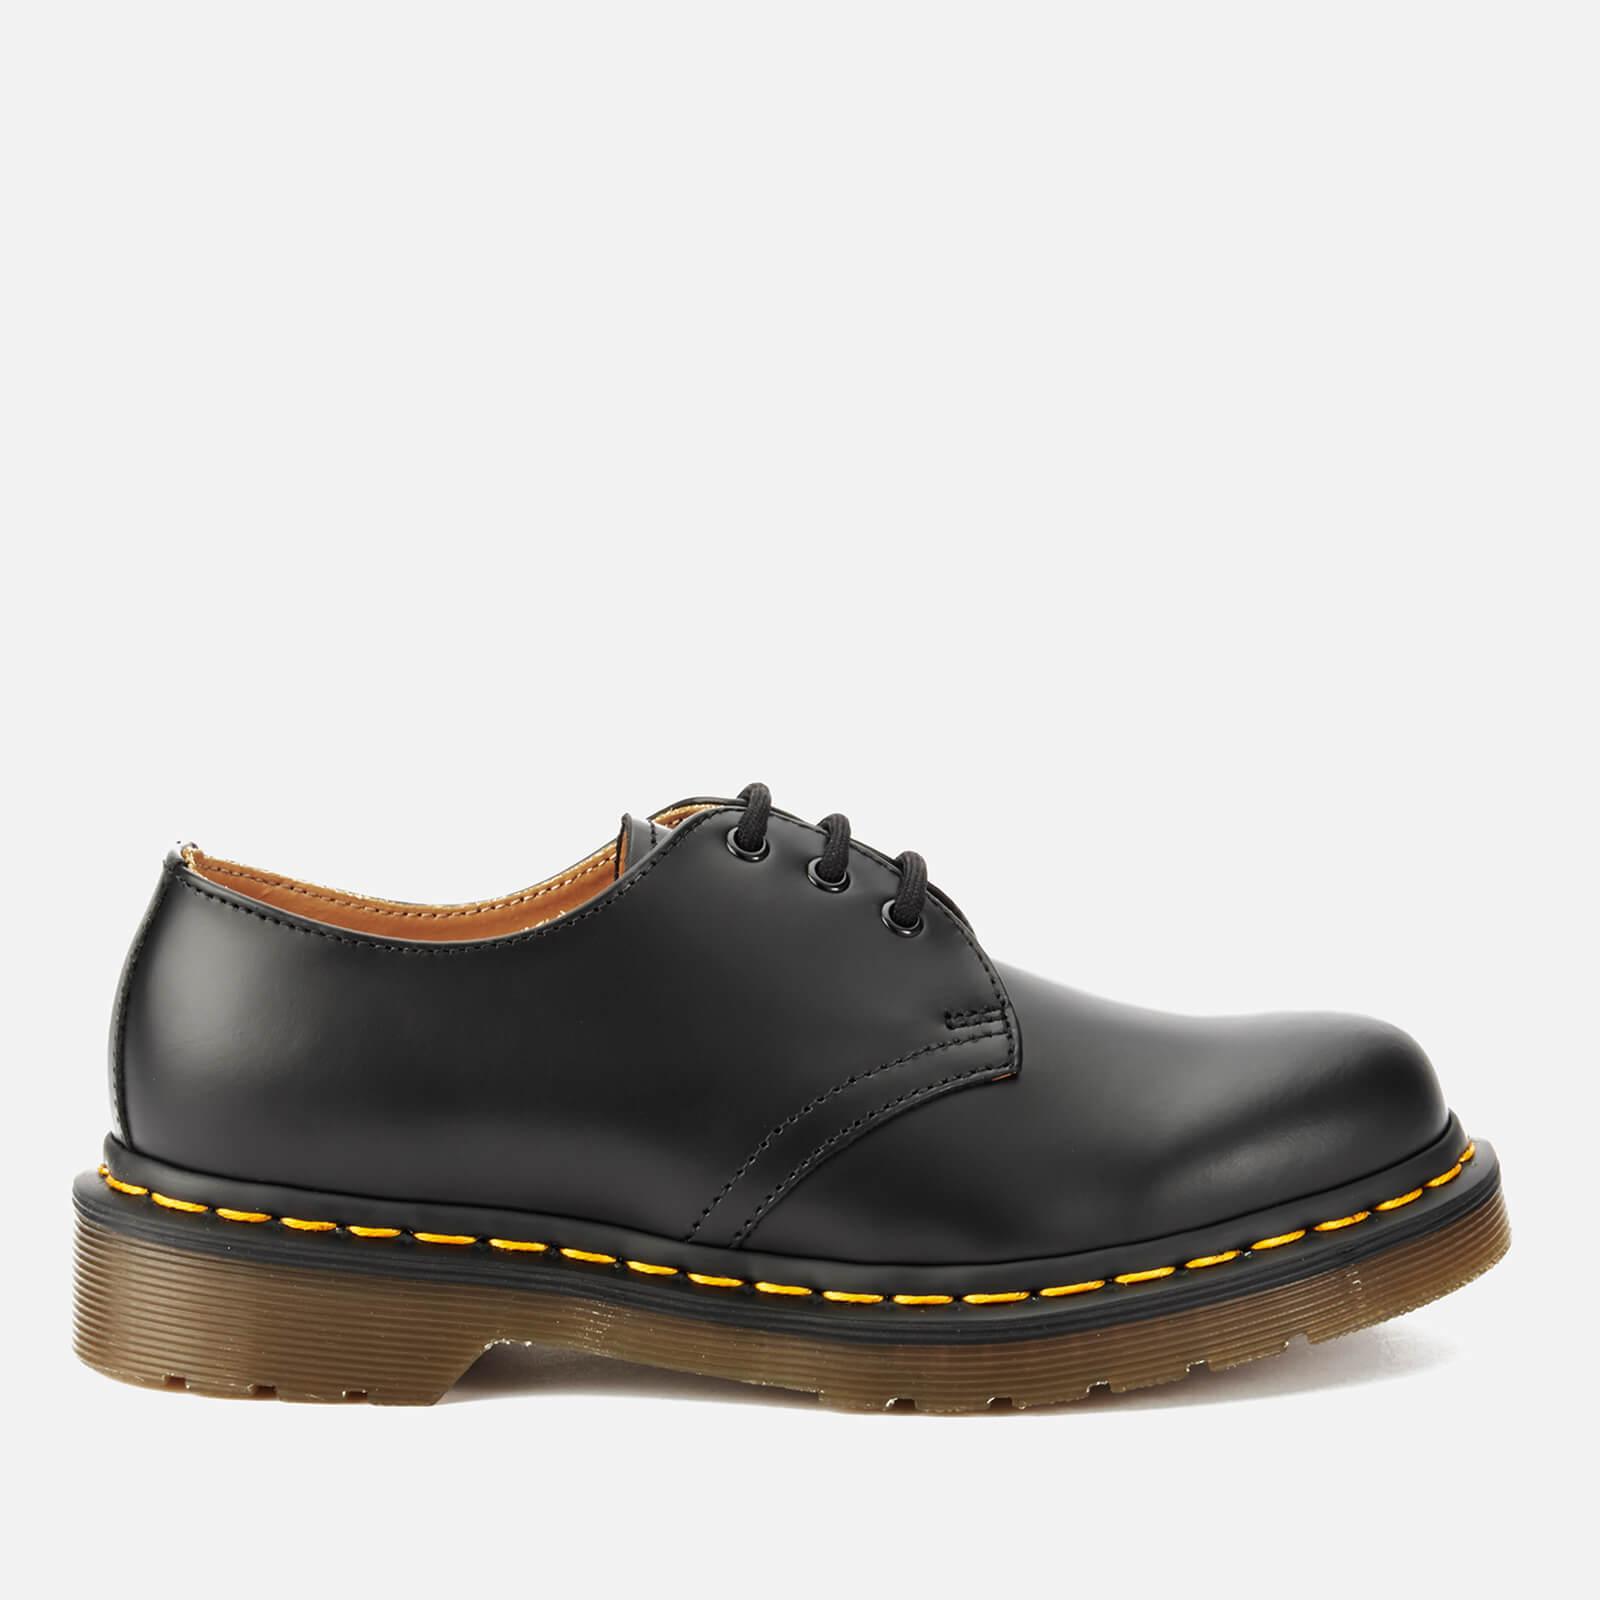 Dr. Martens 1461 Smooth Leather 3-Eye Shoes - Black - UK 3